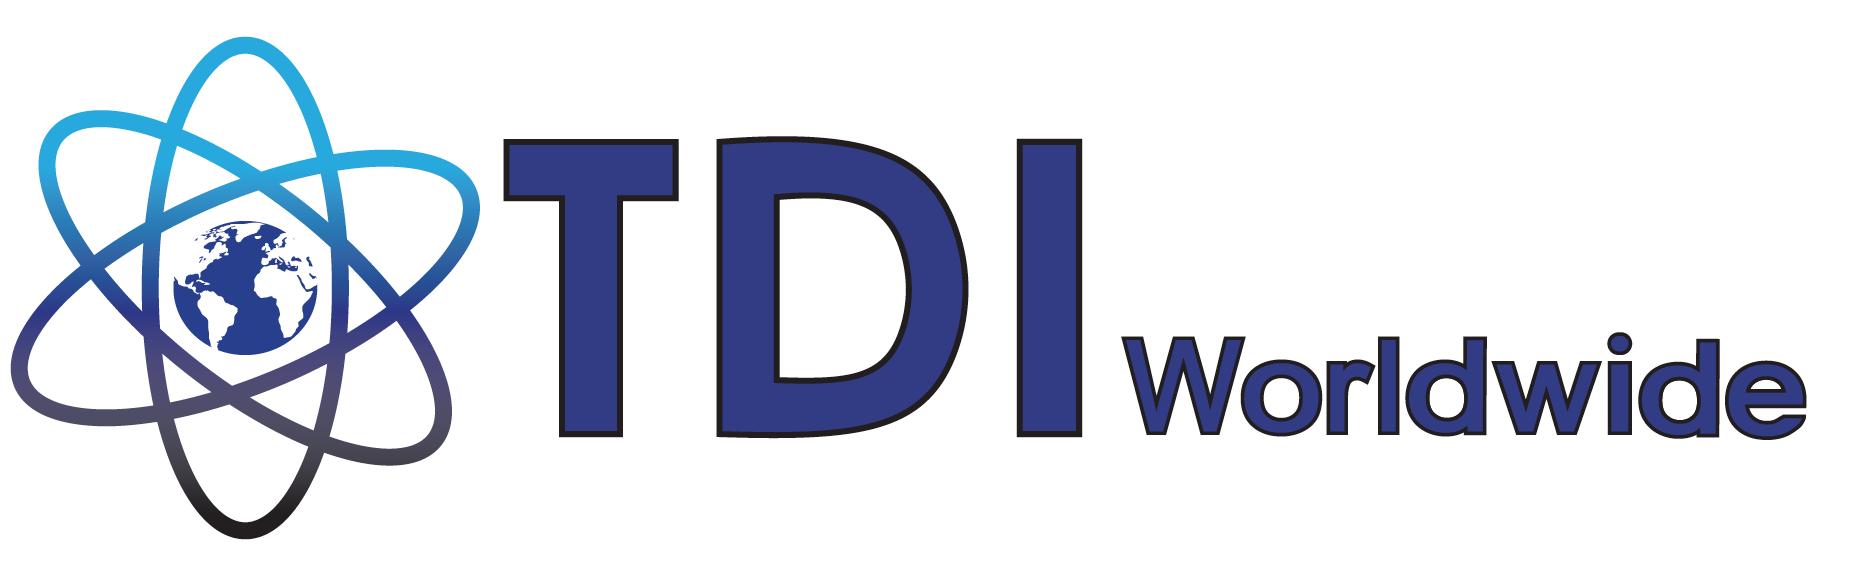 TDIWorldWide_fulllogo